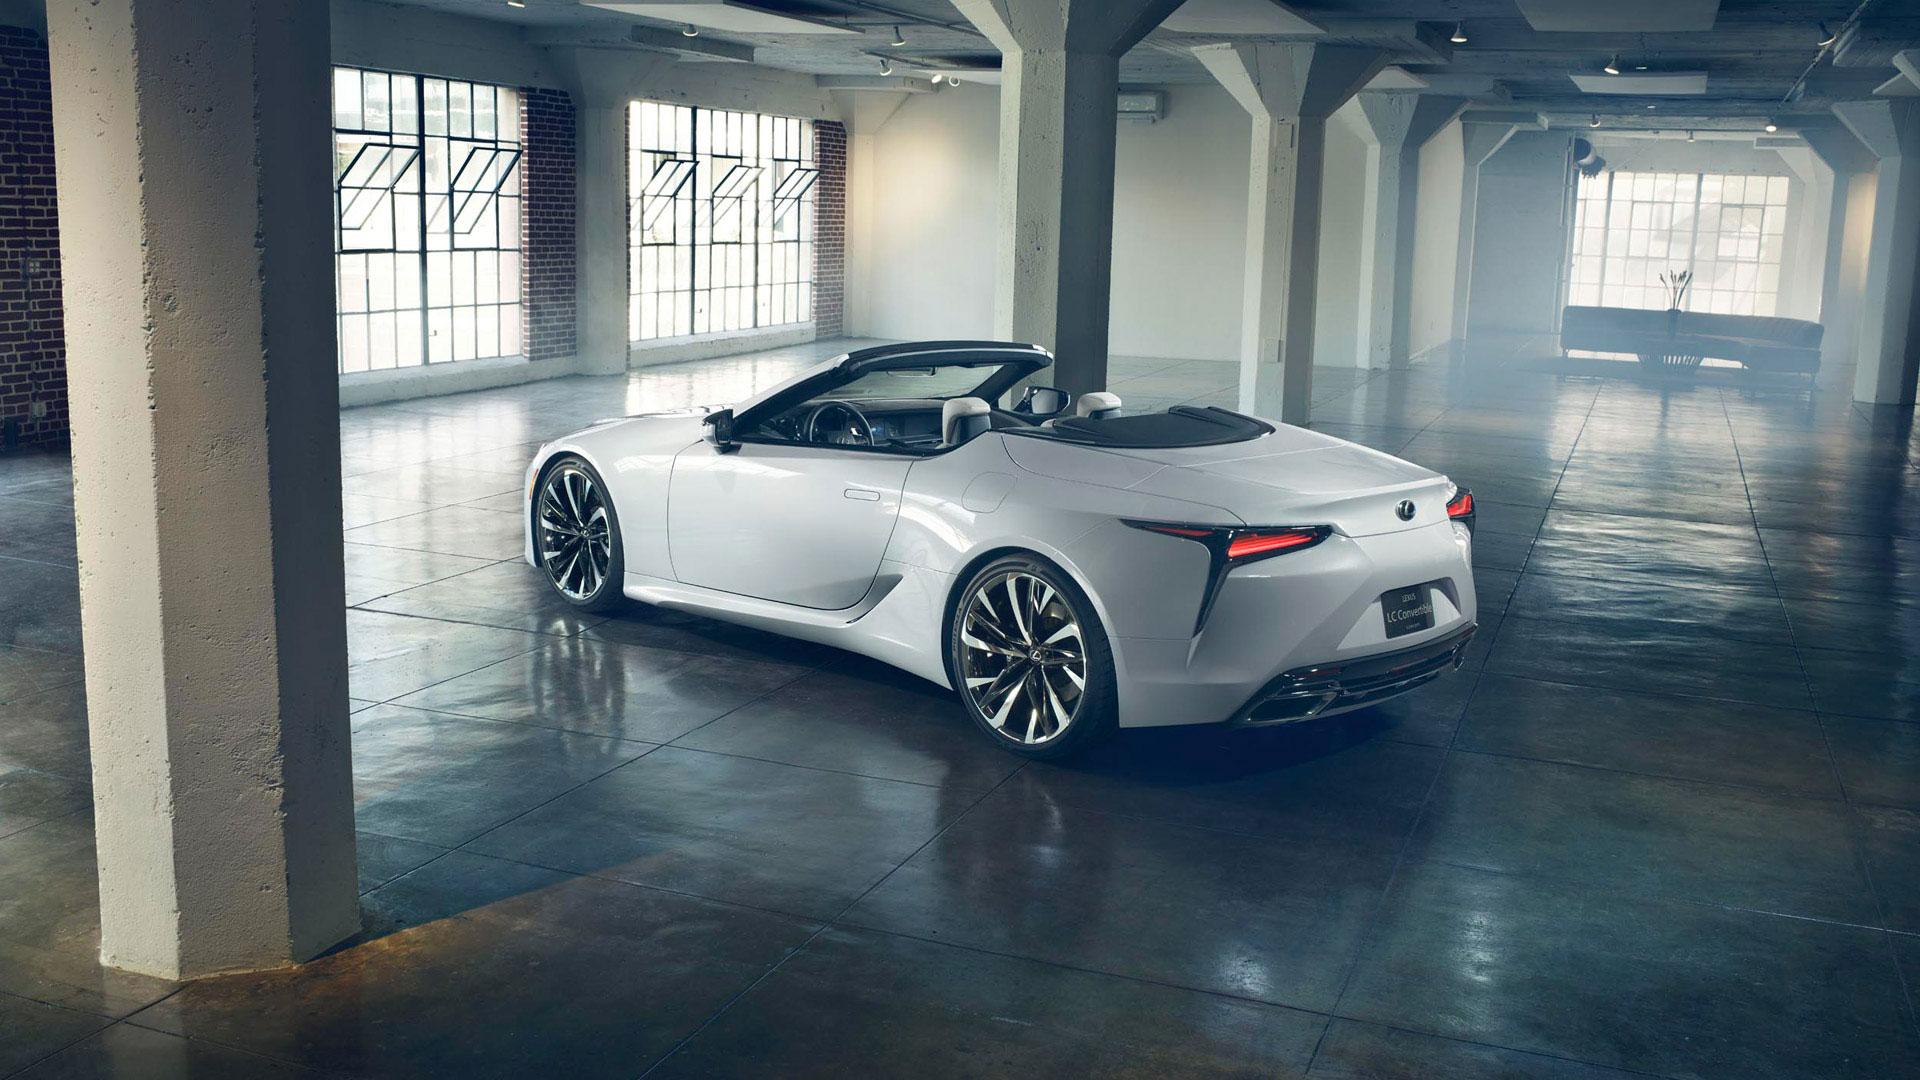 Lexus LC convertible Concept gallery02 1920x1080 v2